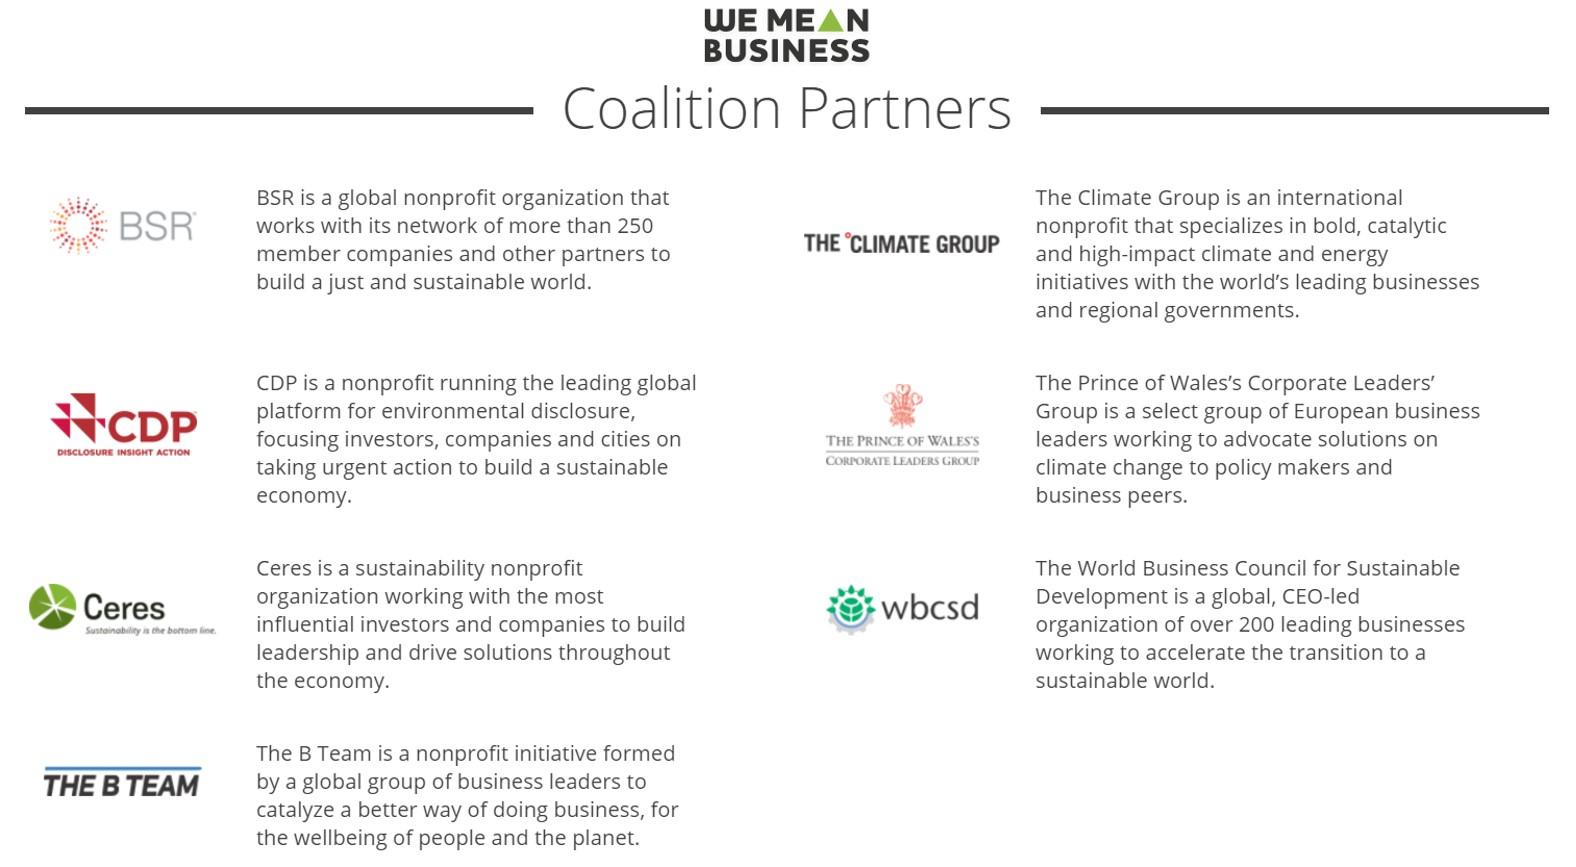 WMB coalition partners desc.jpg